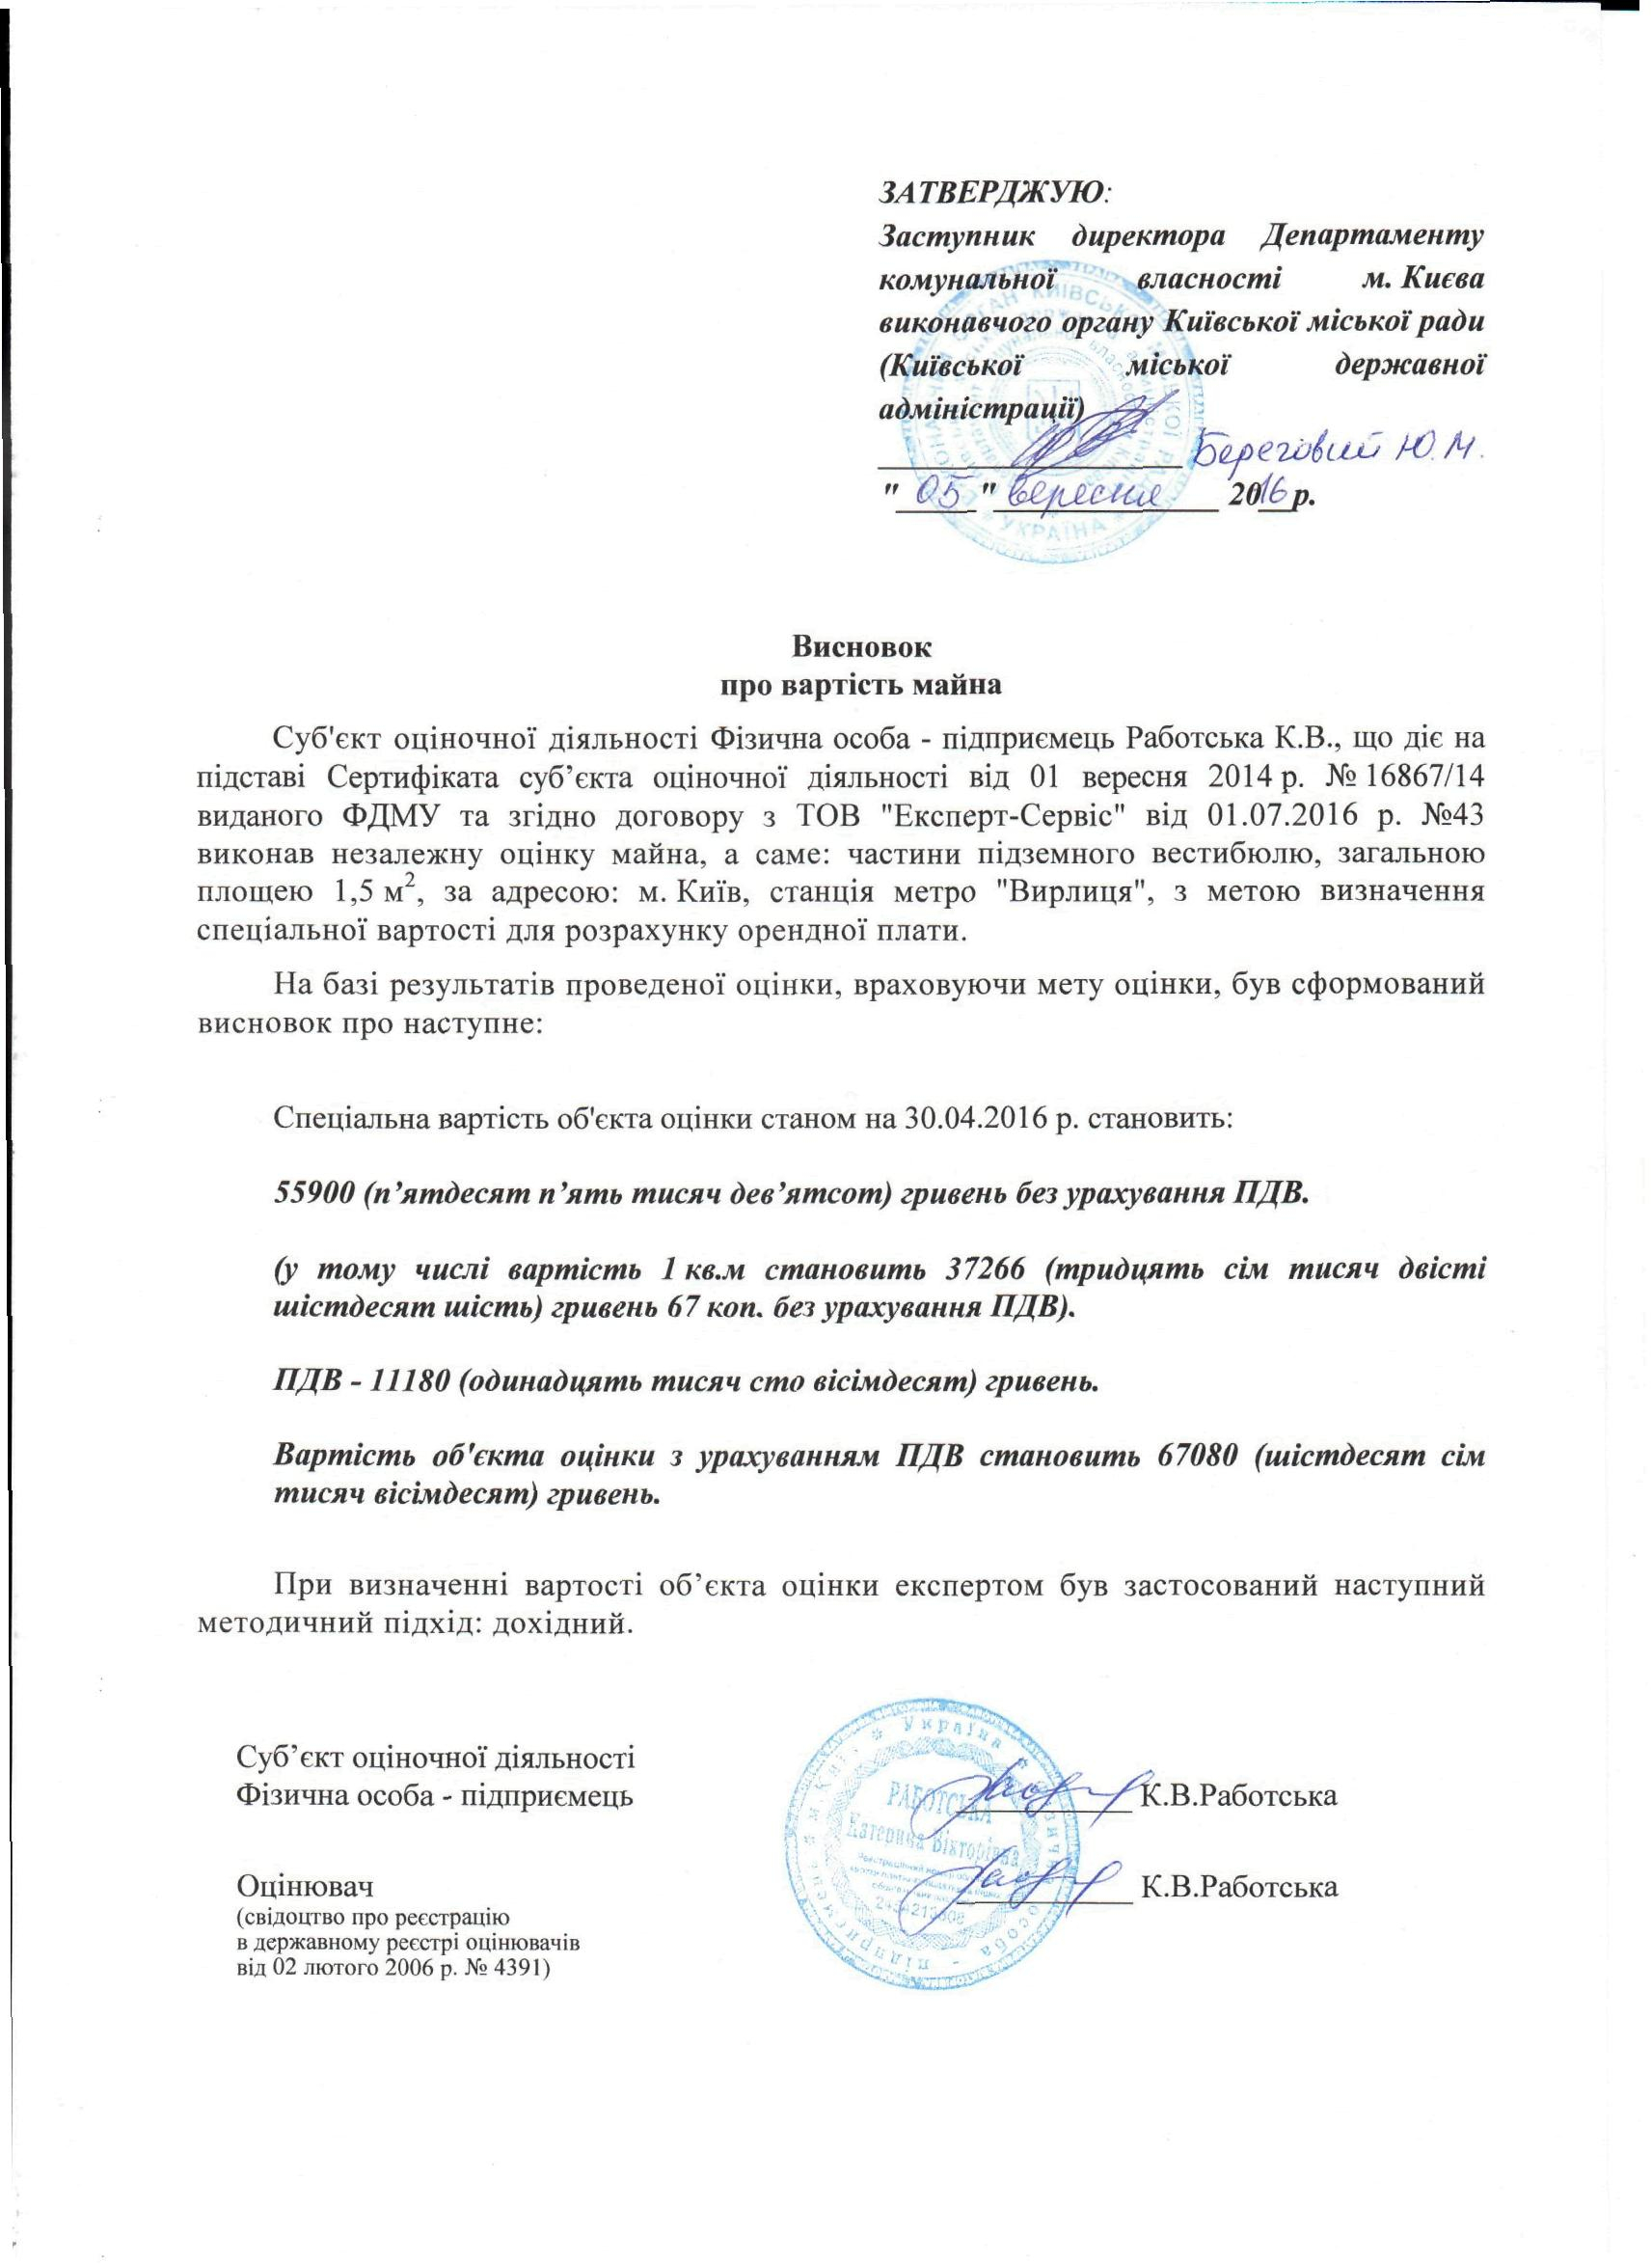 Висновок Вирлиця | Департамент Комунальної Власності М.києва For Is Full Sail Quarter Or Semester